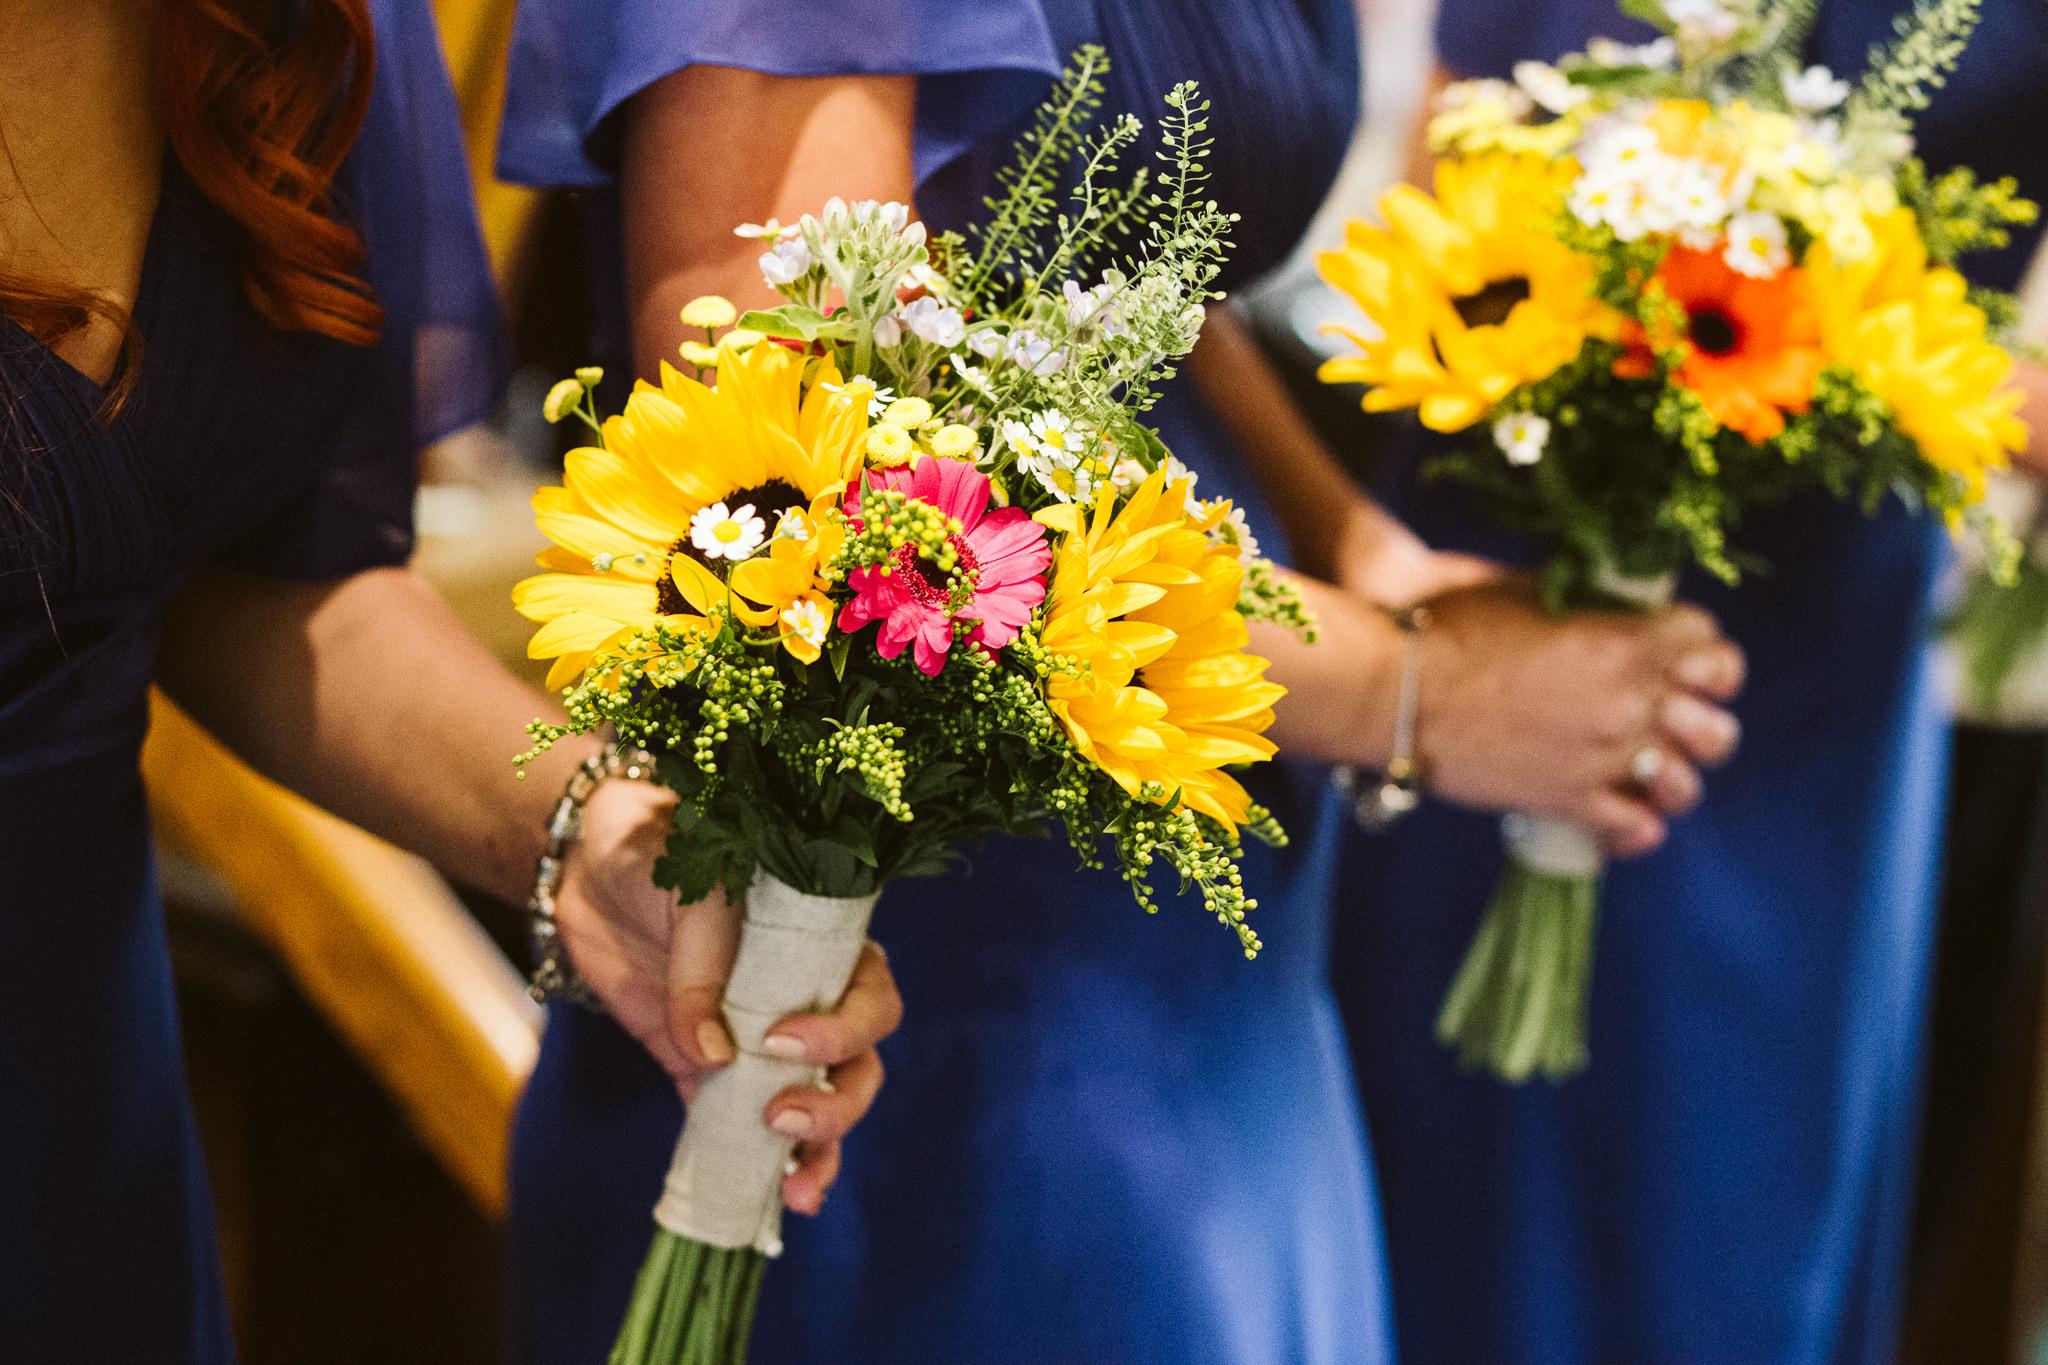 northside-farm-wedding-northumberland-margarita-hope (23).jpg